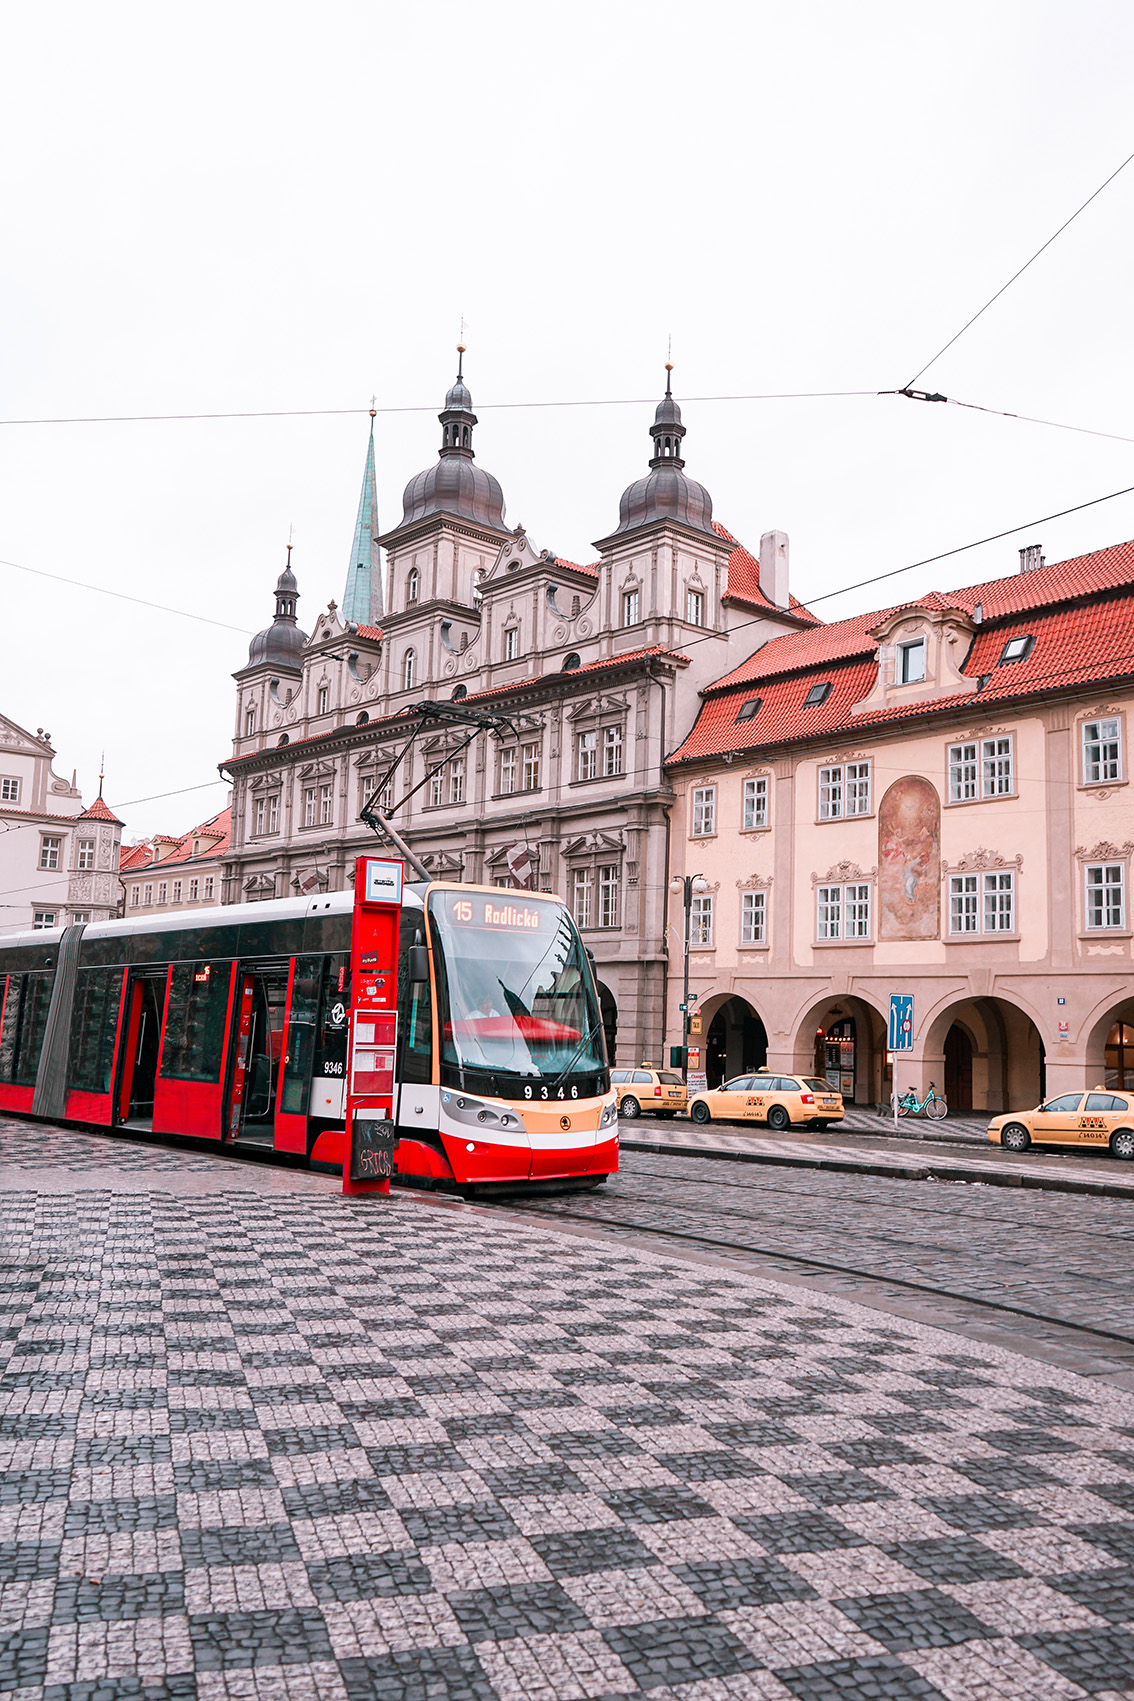 17 Weekend a Praga: 7 cose da vedere, dove dormire, gli indirizzi food e i Mercatini di Natale più belli.